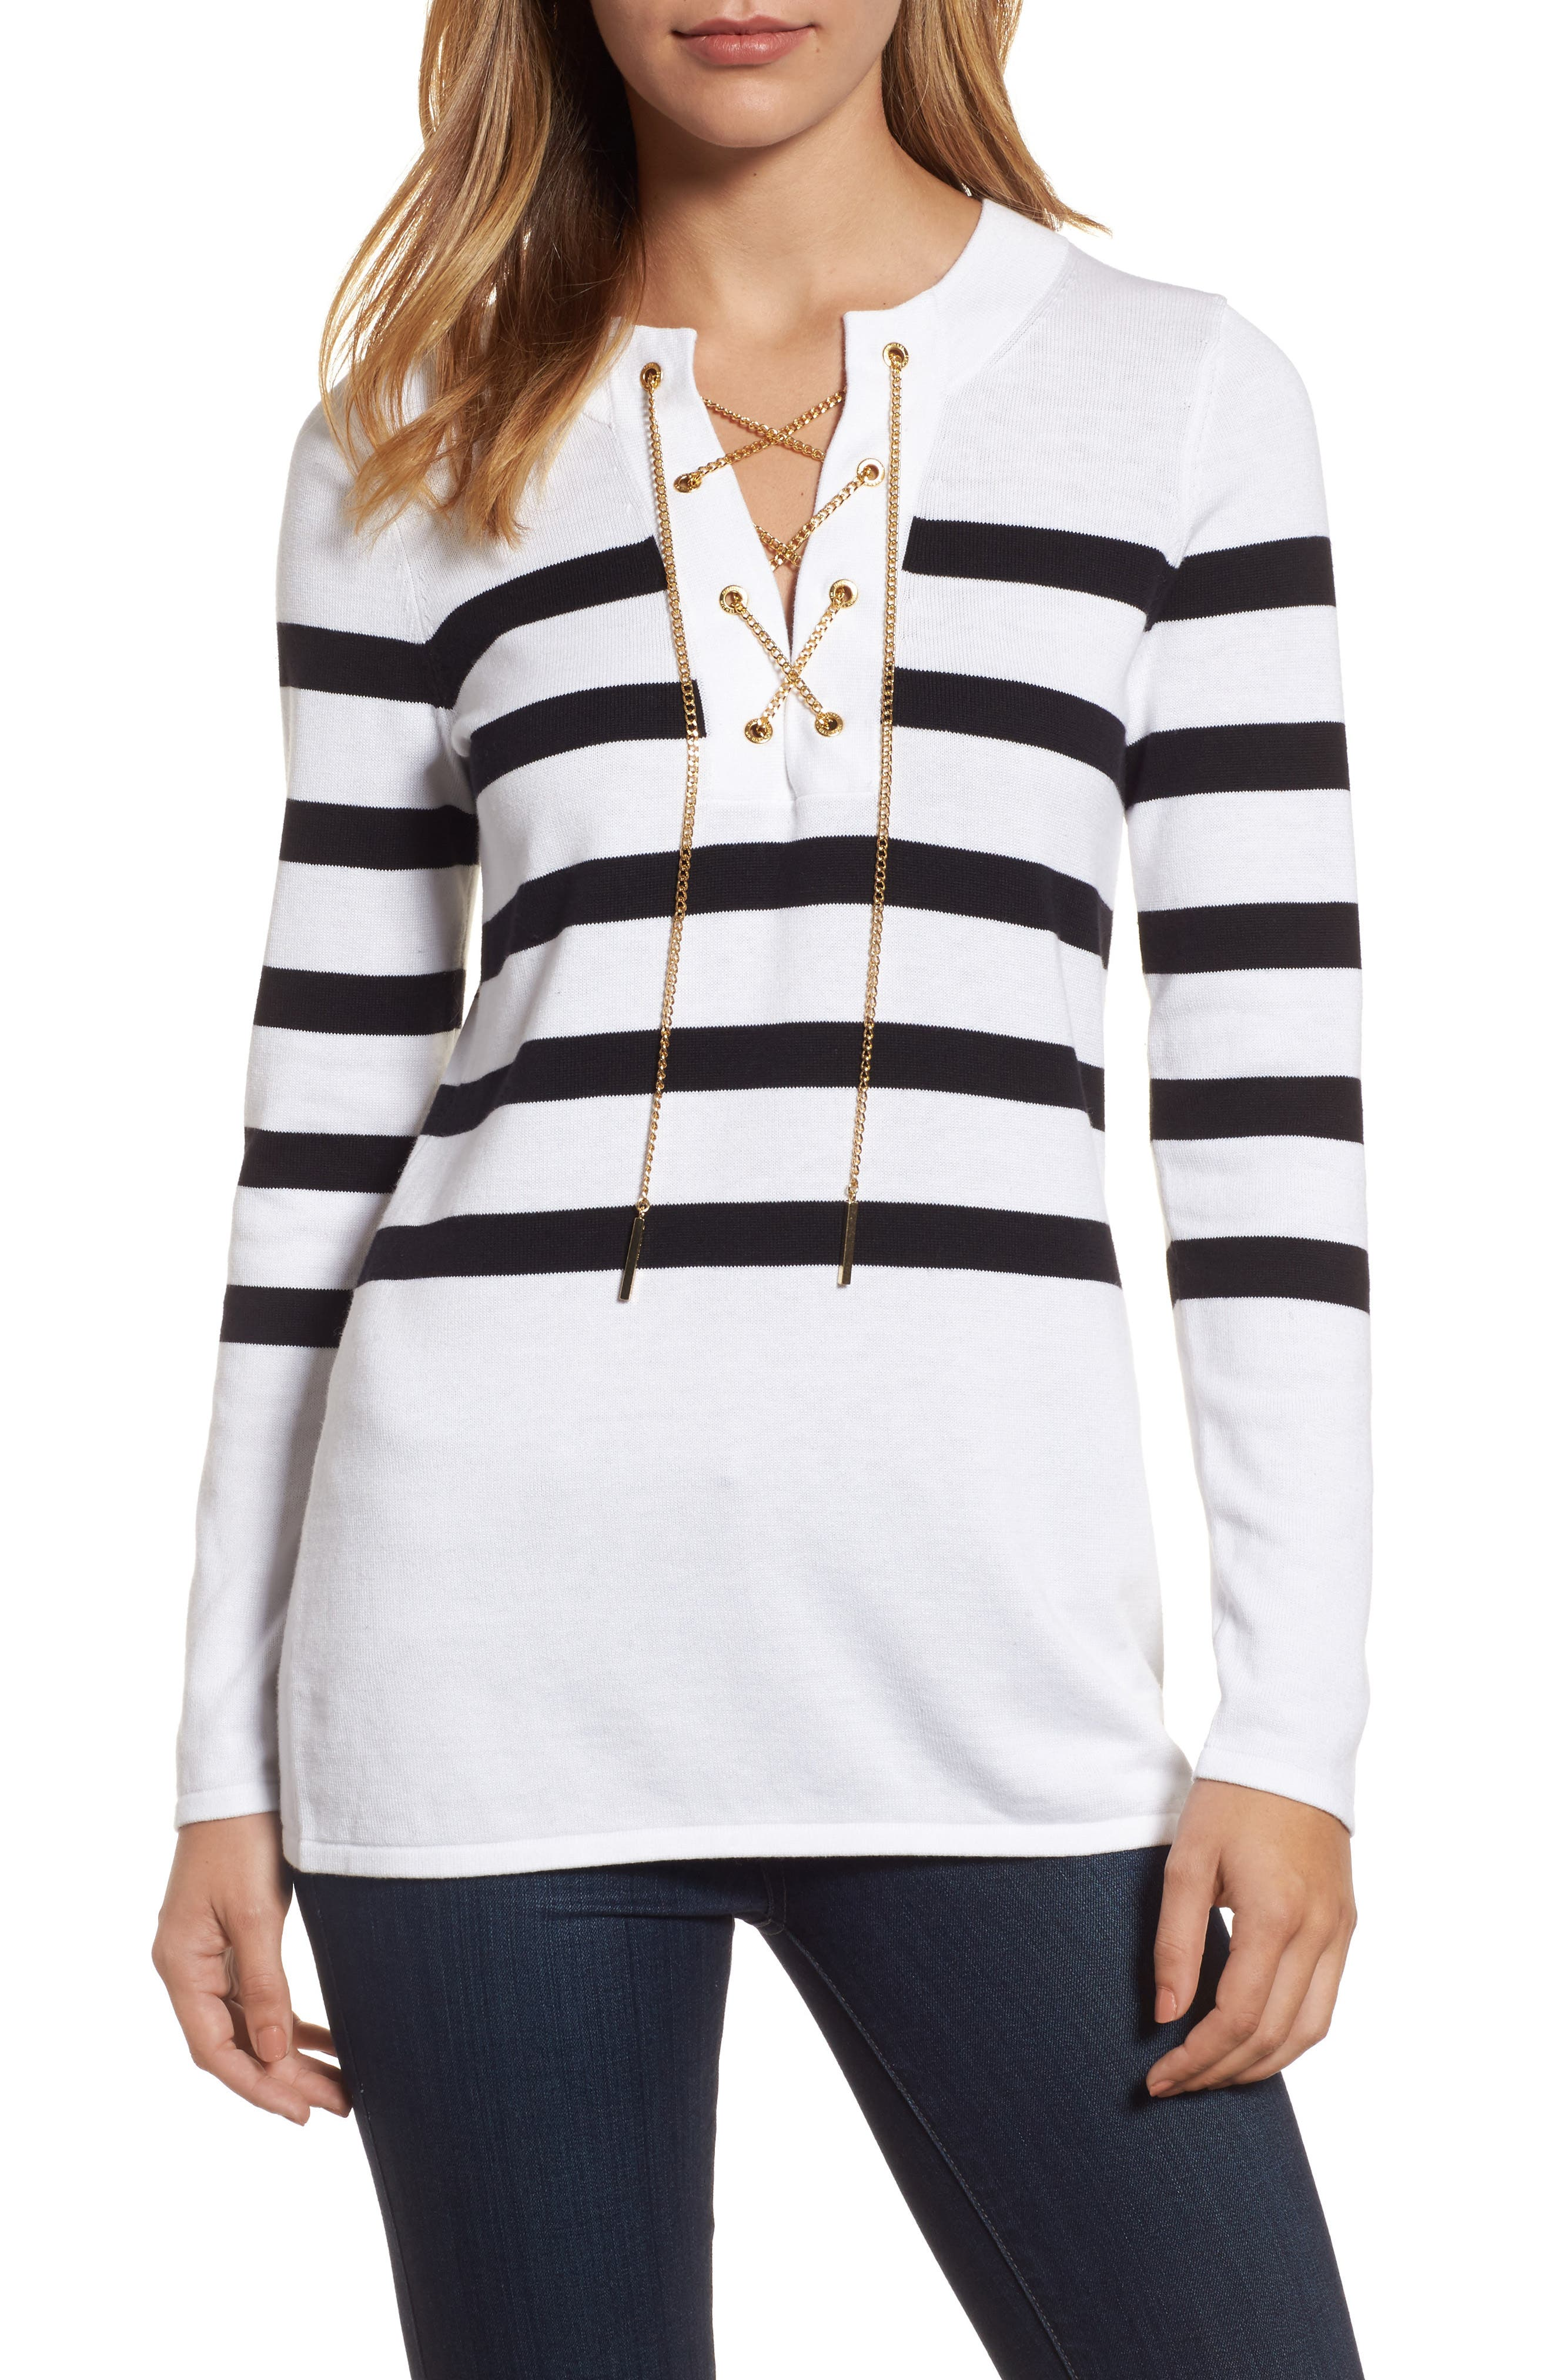 Laced Chain Tunic,                             Main thumbnail 1, color,                             White/ Black